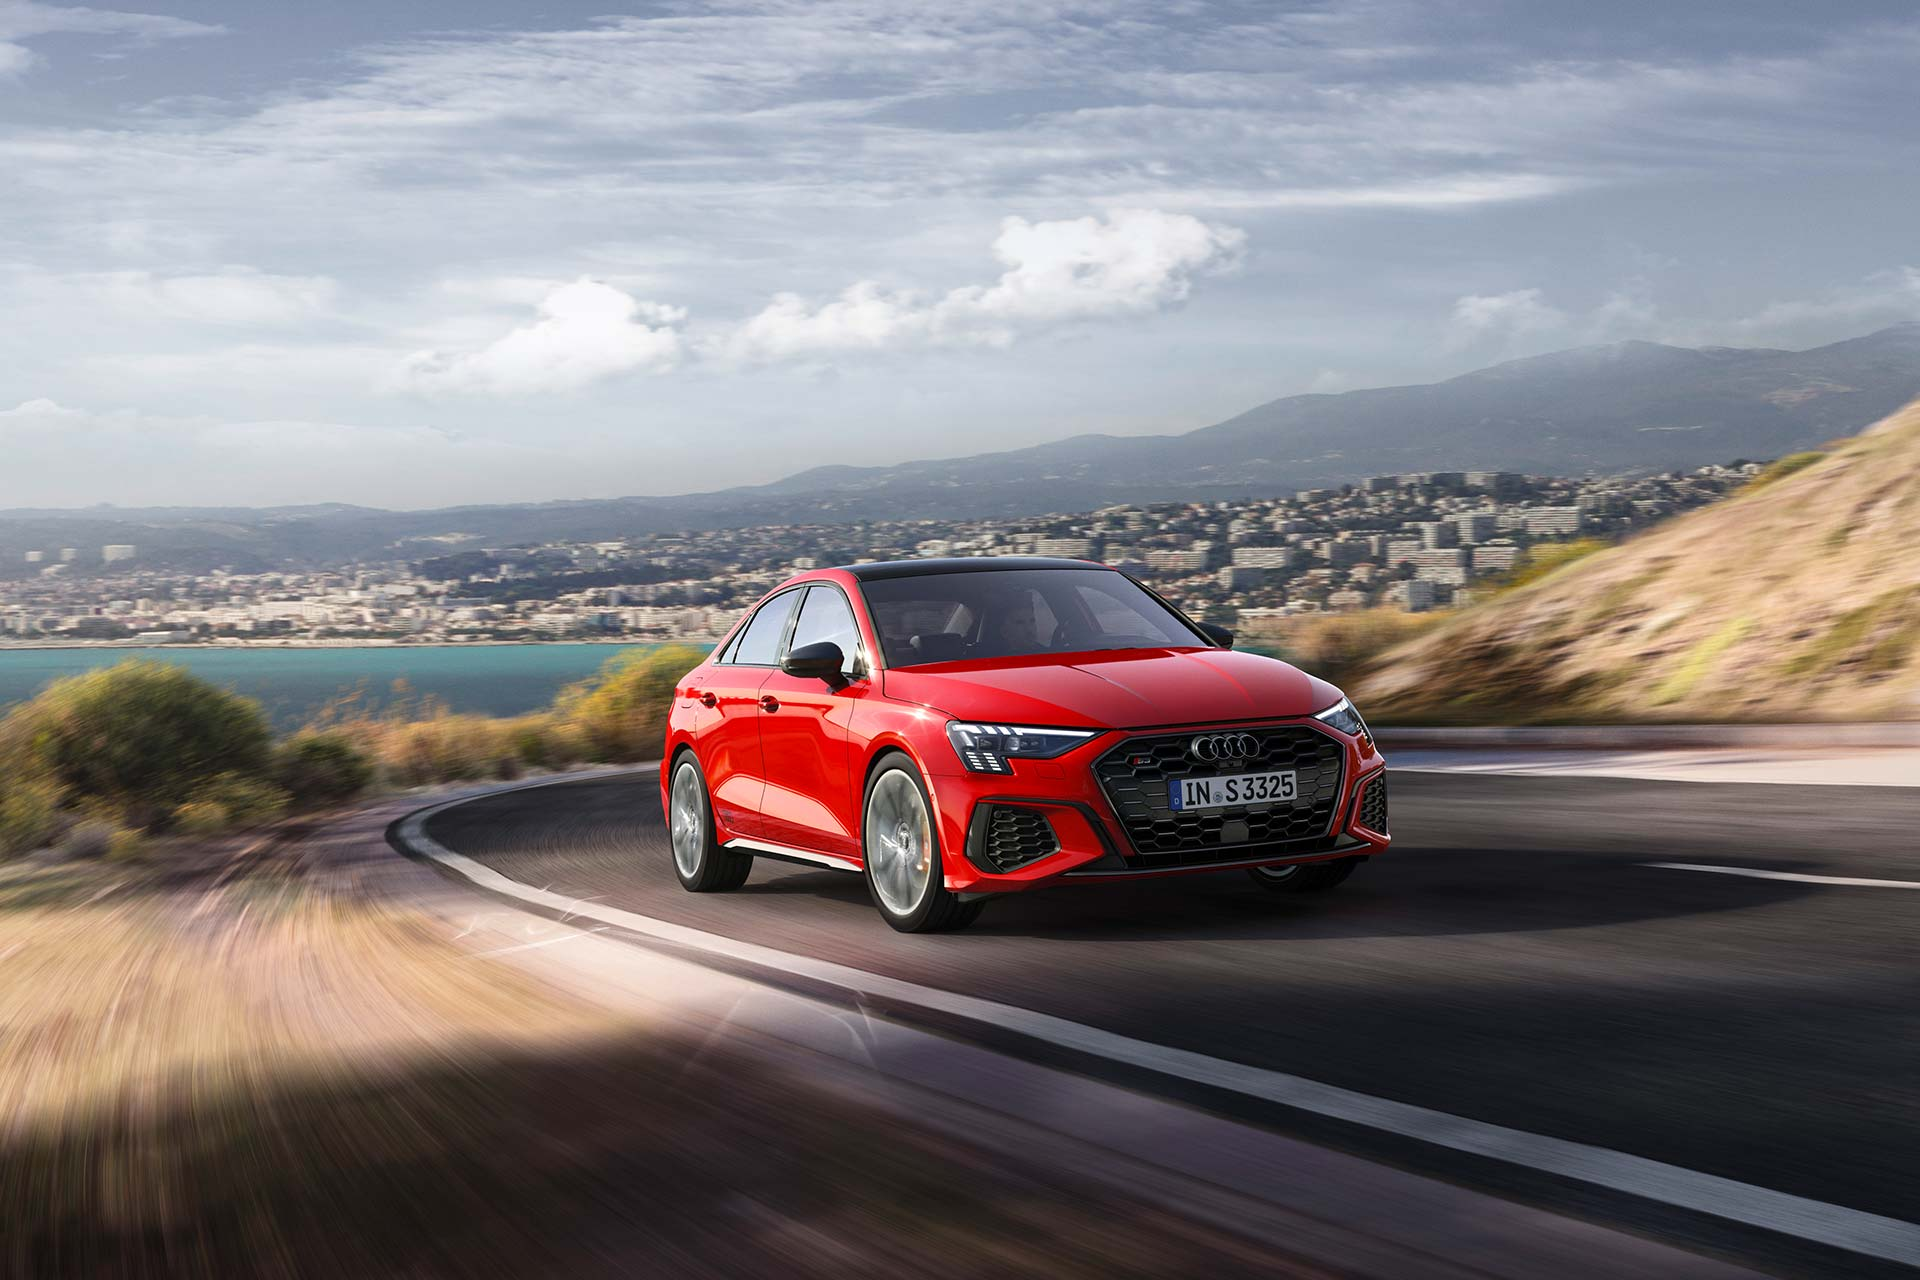 New 2020 Audi S3 sedan driving front